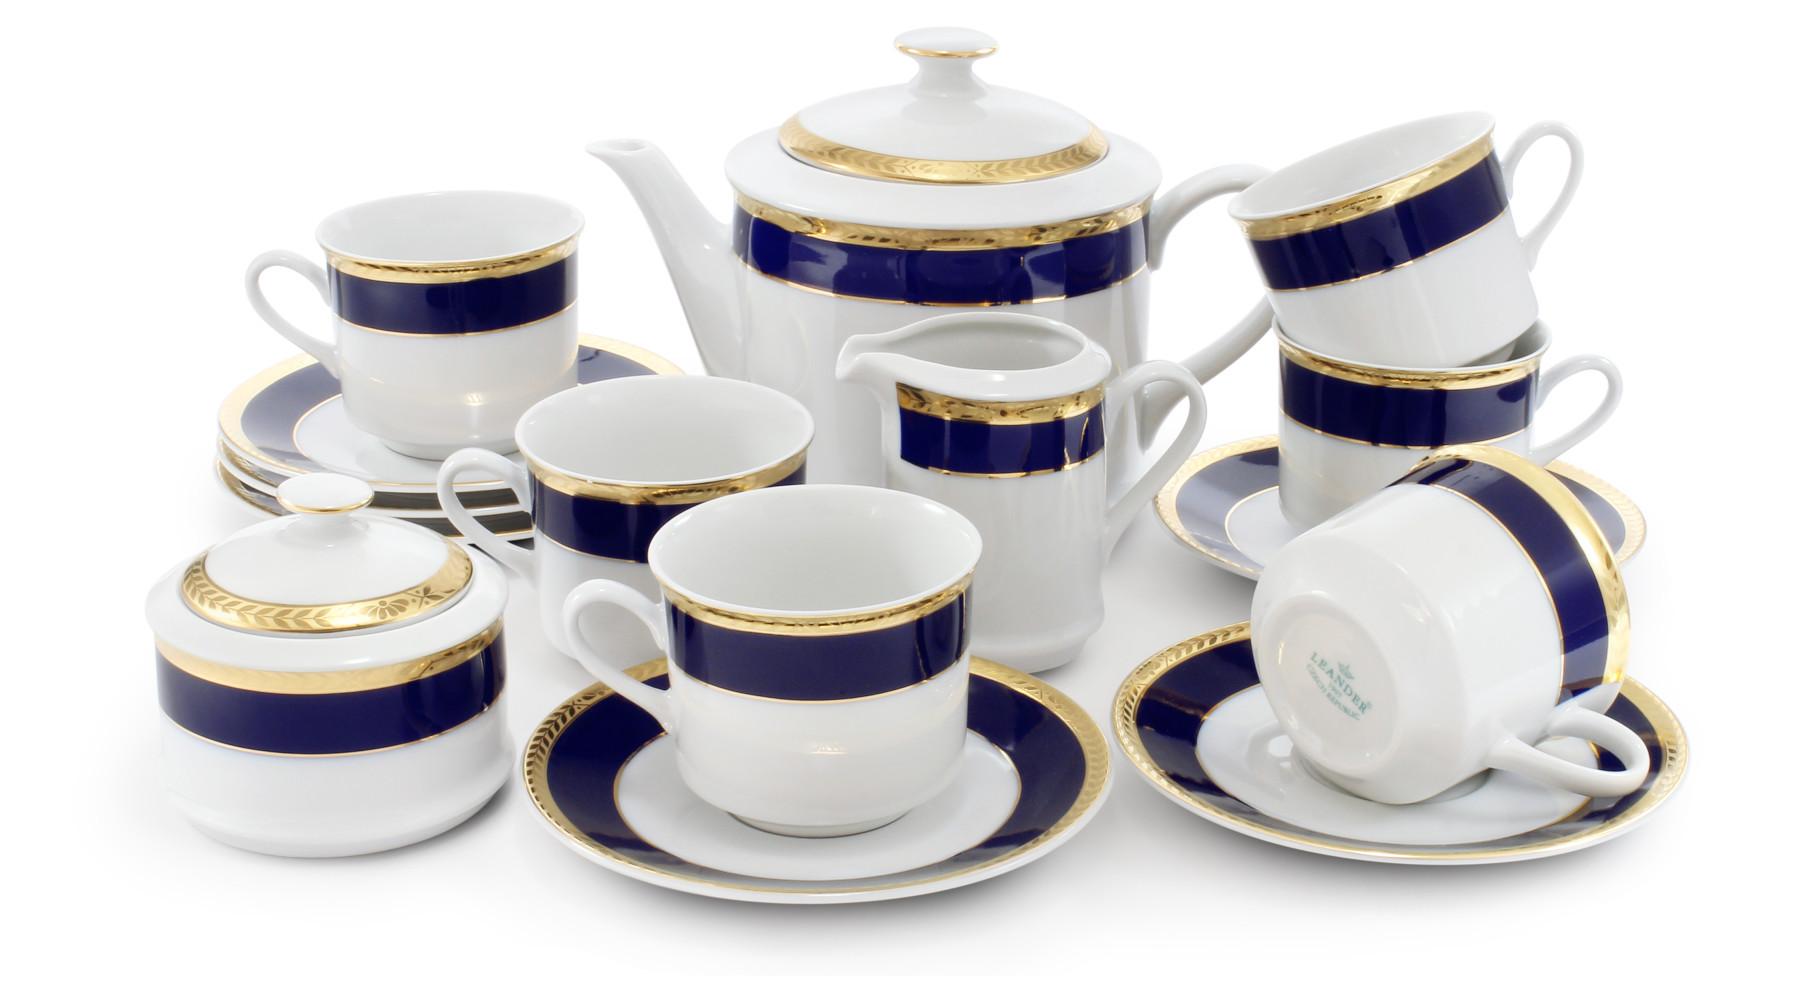 Tea set 15-piece - Cobalt and gold braid